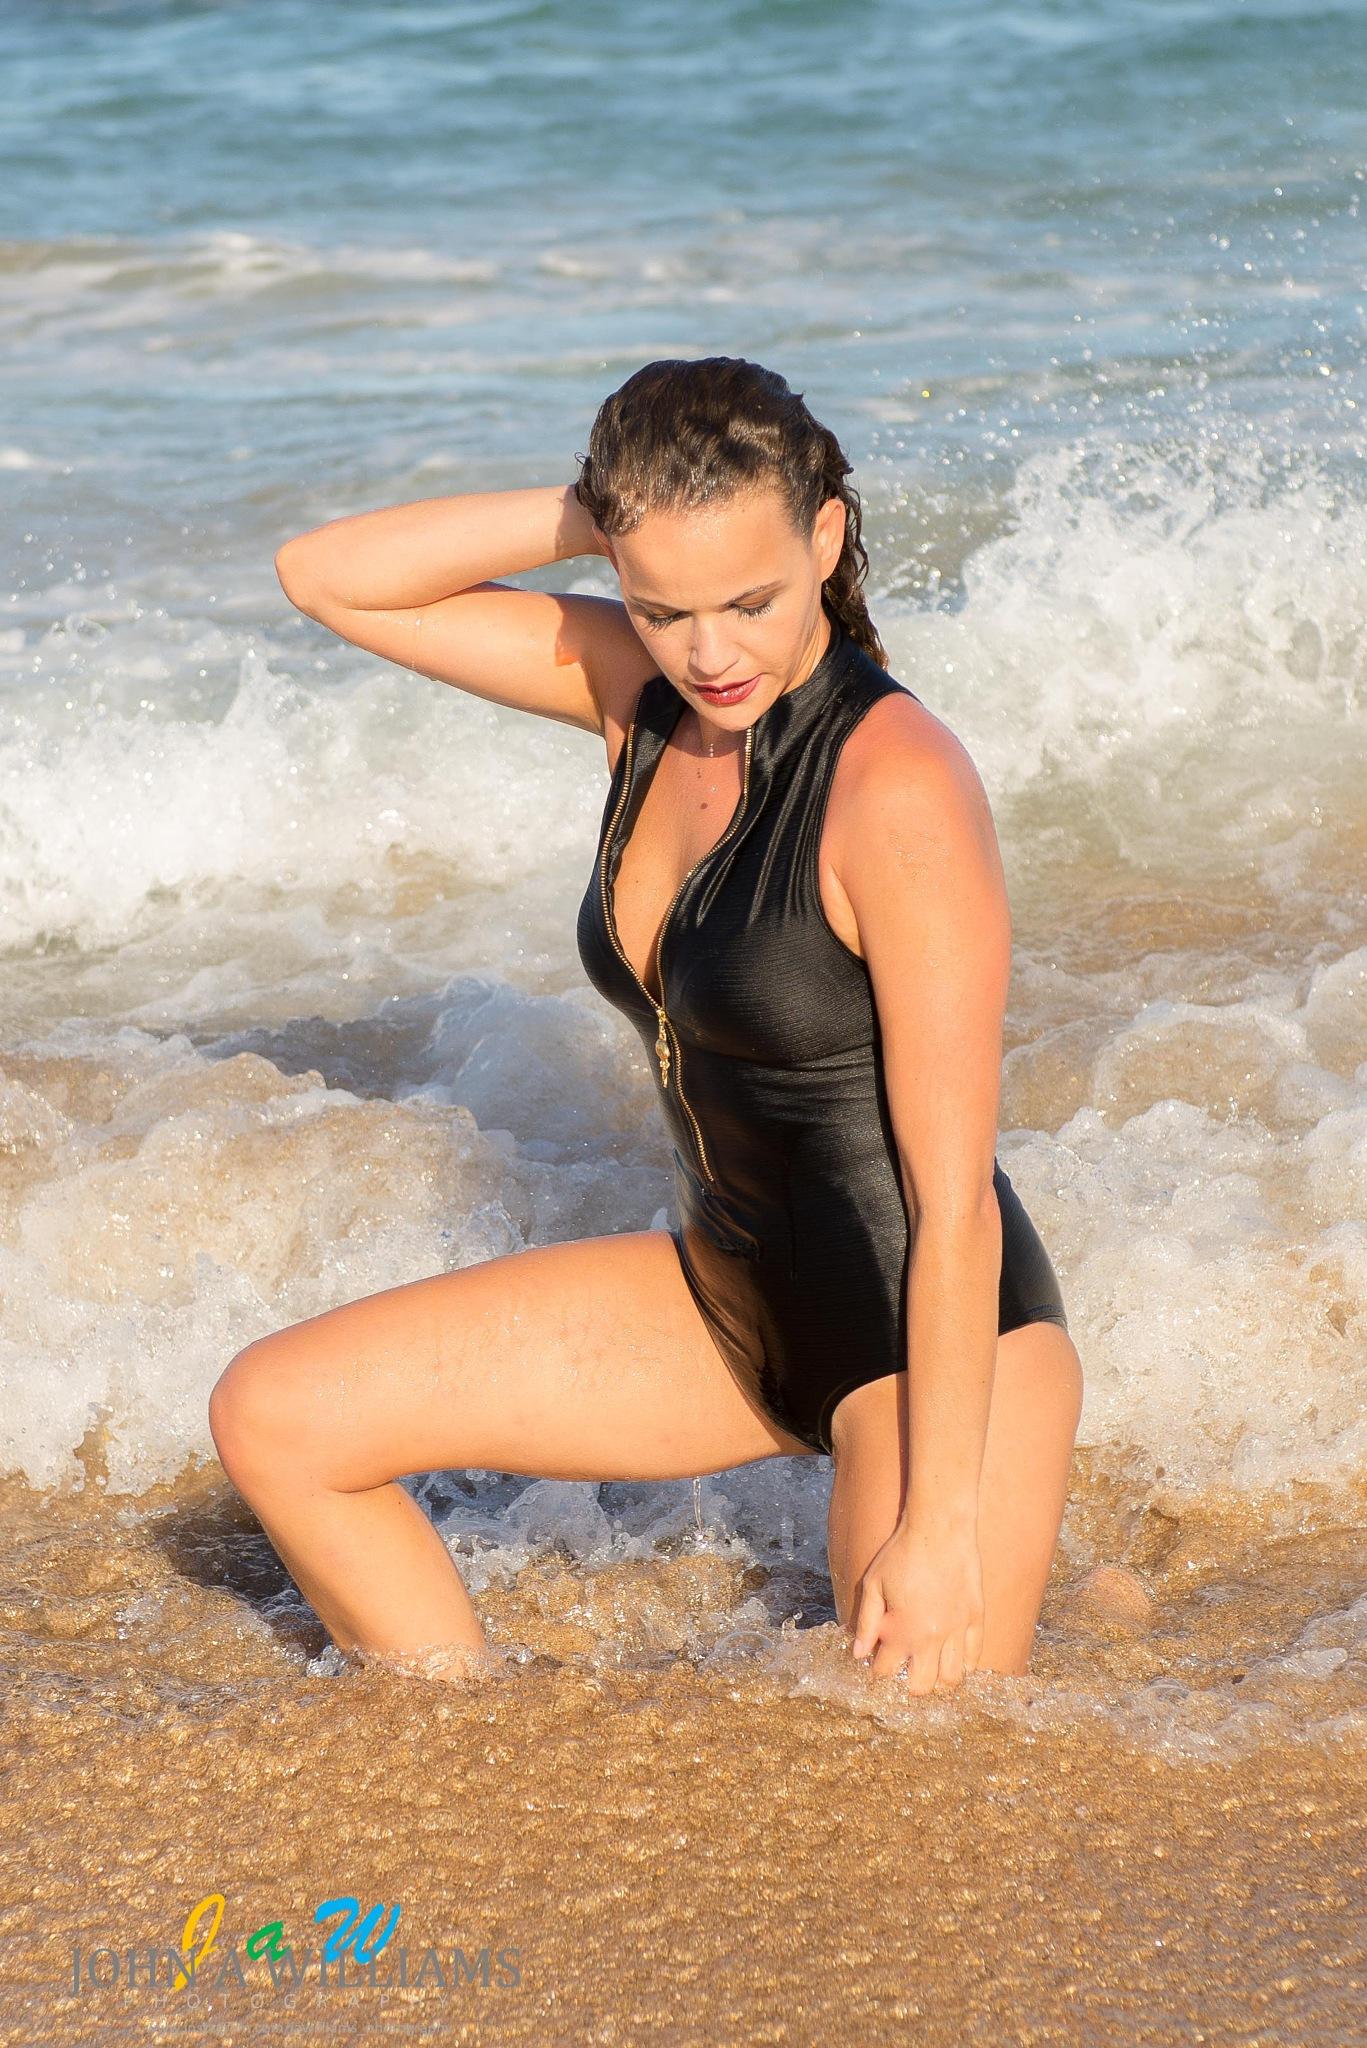 Photo in People #beach #sexy #beautiful #waves #sand #summer #sunshine #model #stunning #bikini #wet